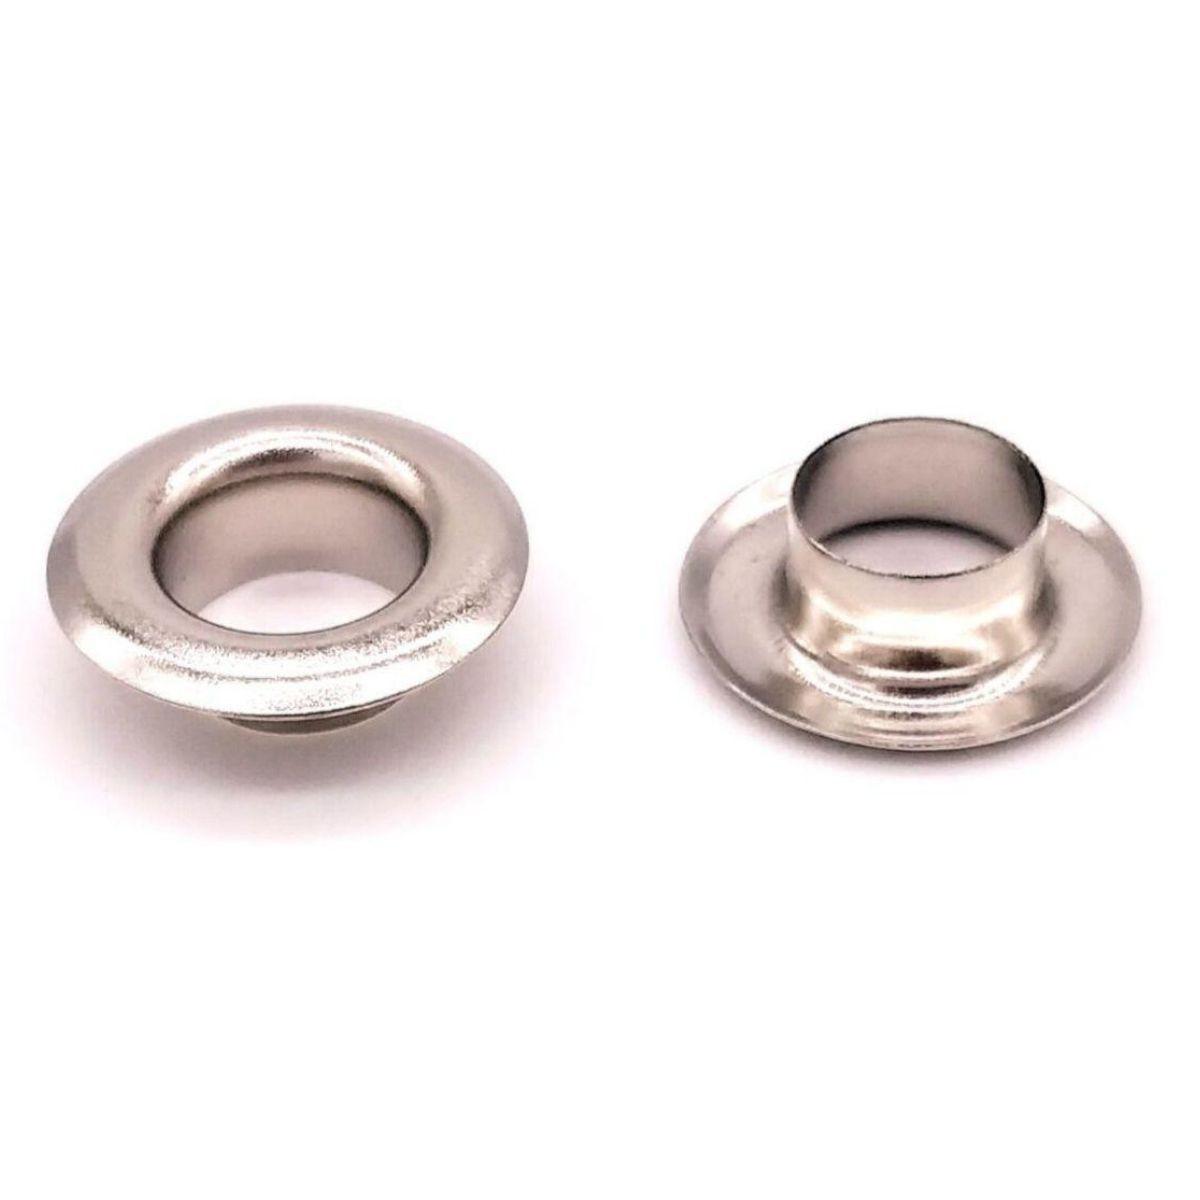 Ilhós Nº 45 Alumínio Niquelado